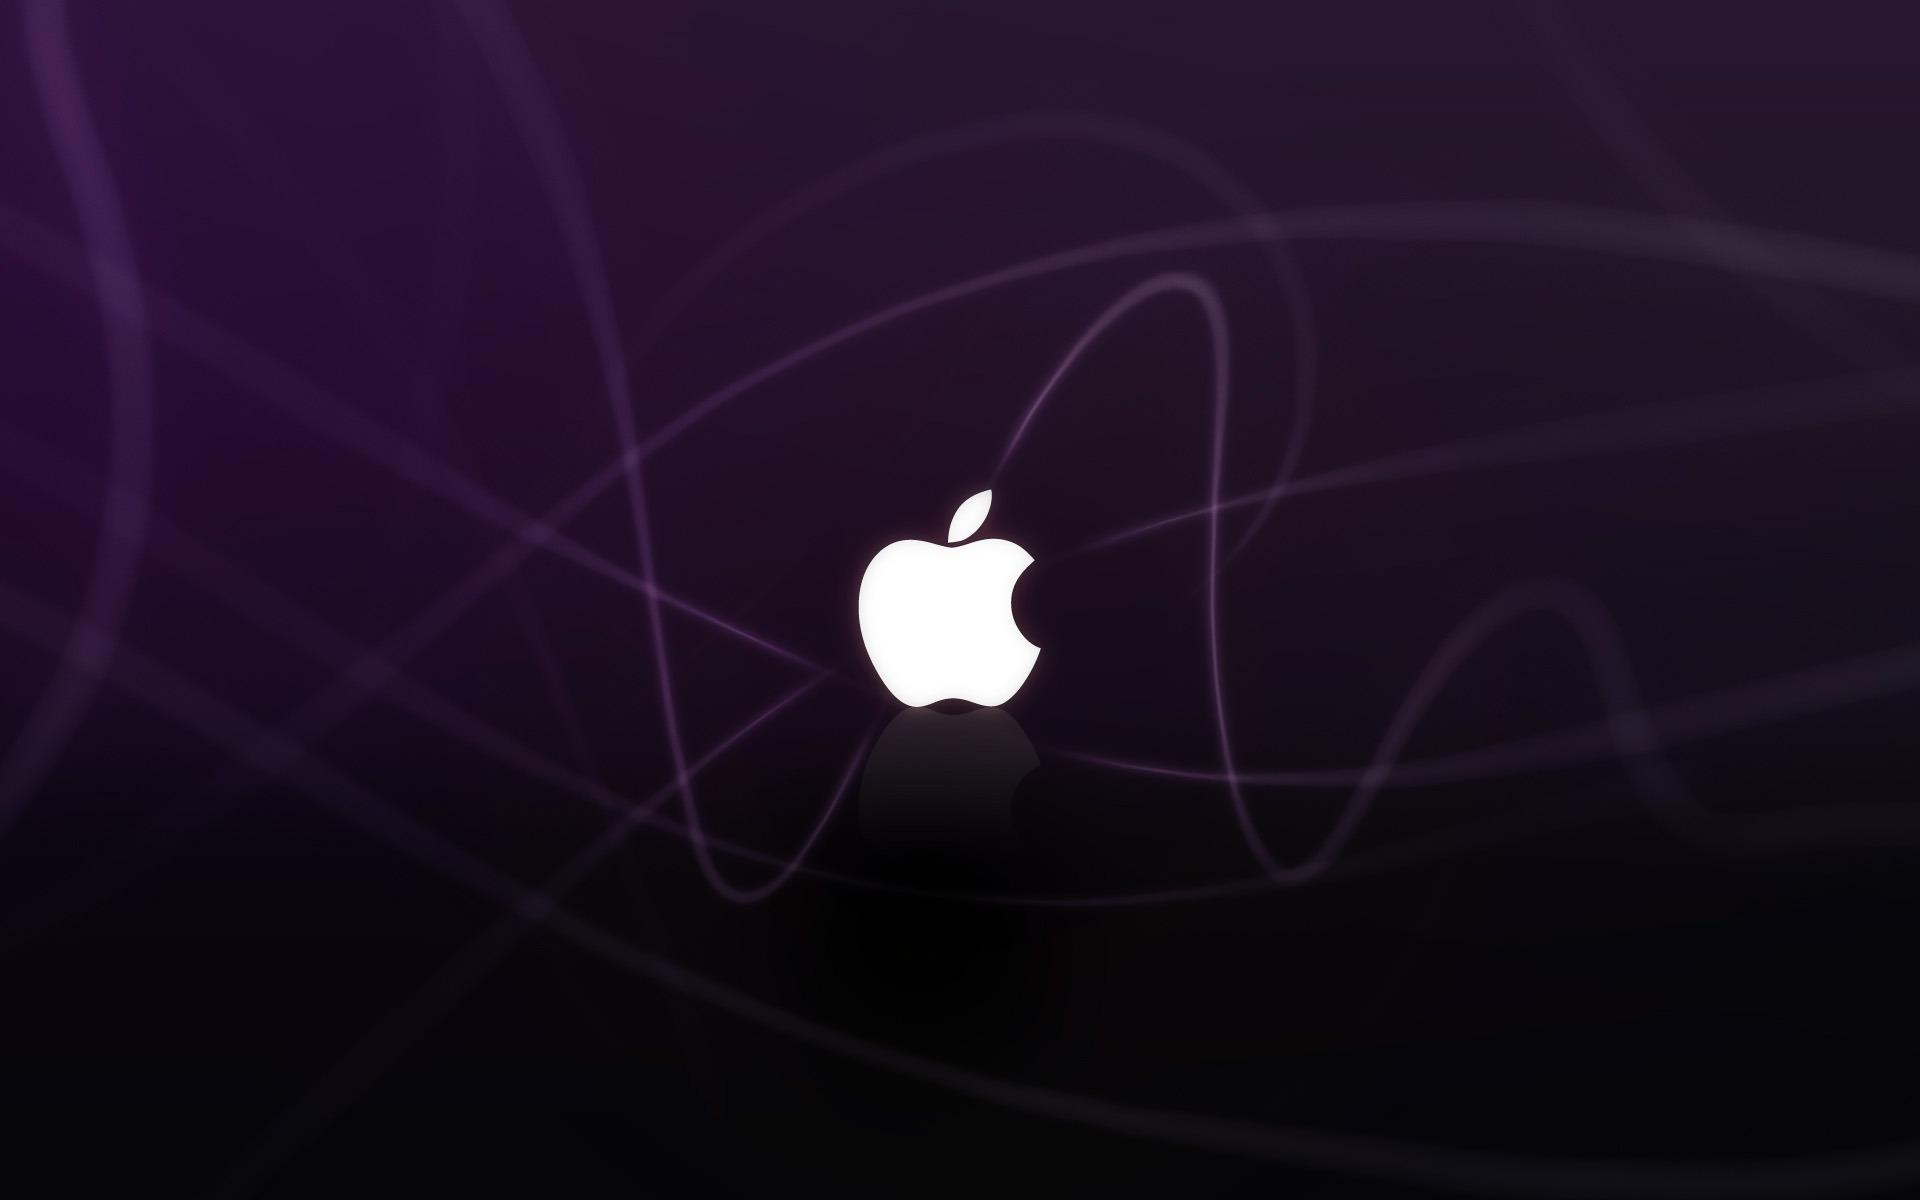 Apple Logo Purple Waves Wallpapers HD Wallpapers 1920x1200